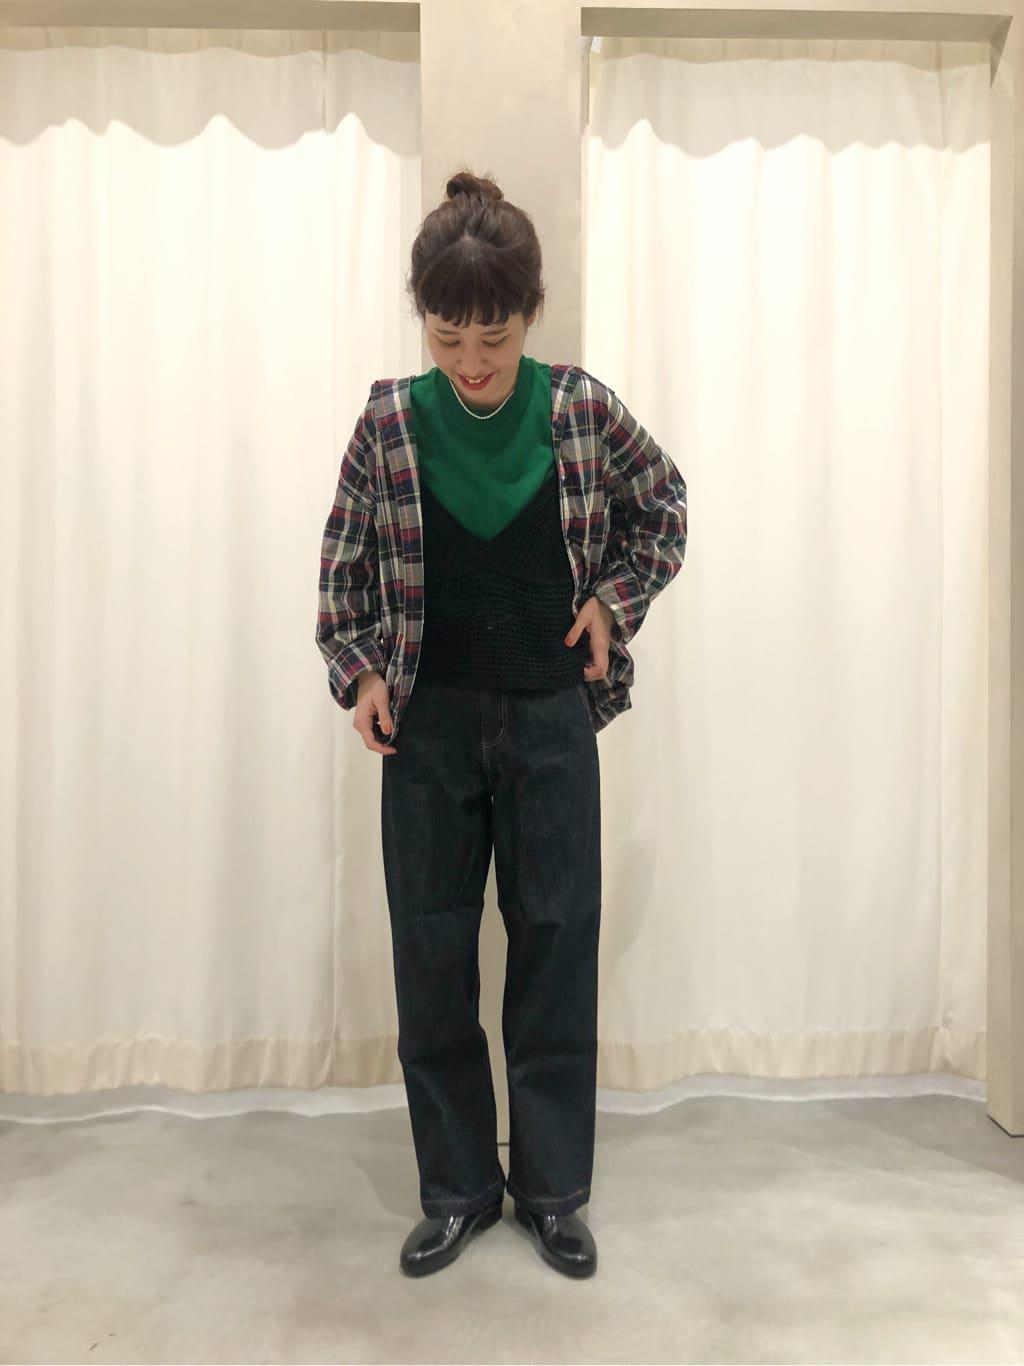 - CHILD WOMAN CHILD WOMAN , PAR ICI 東京スカイツリータウン・ソラマチ 身長:160cm 2021.08.23